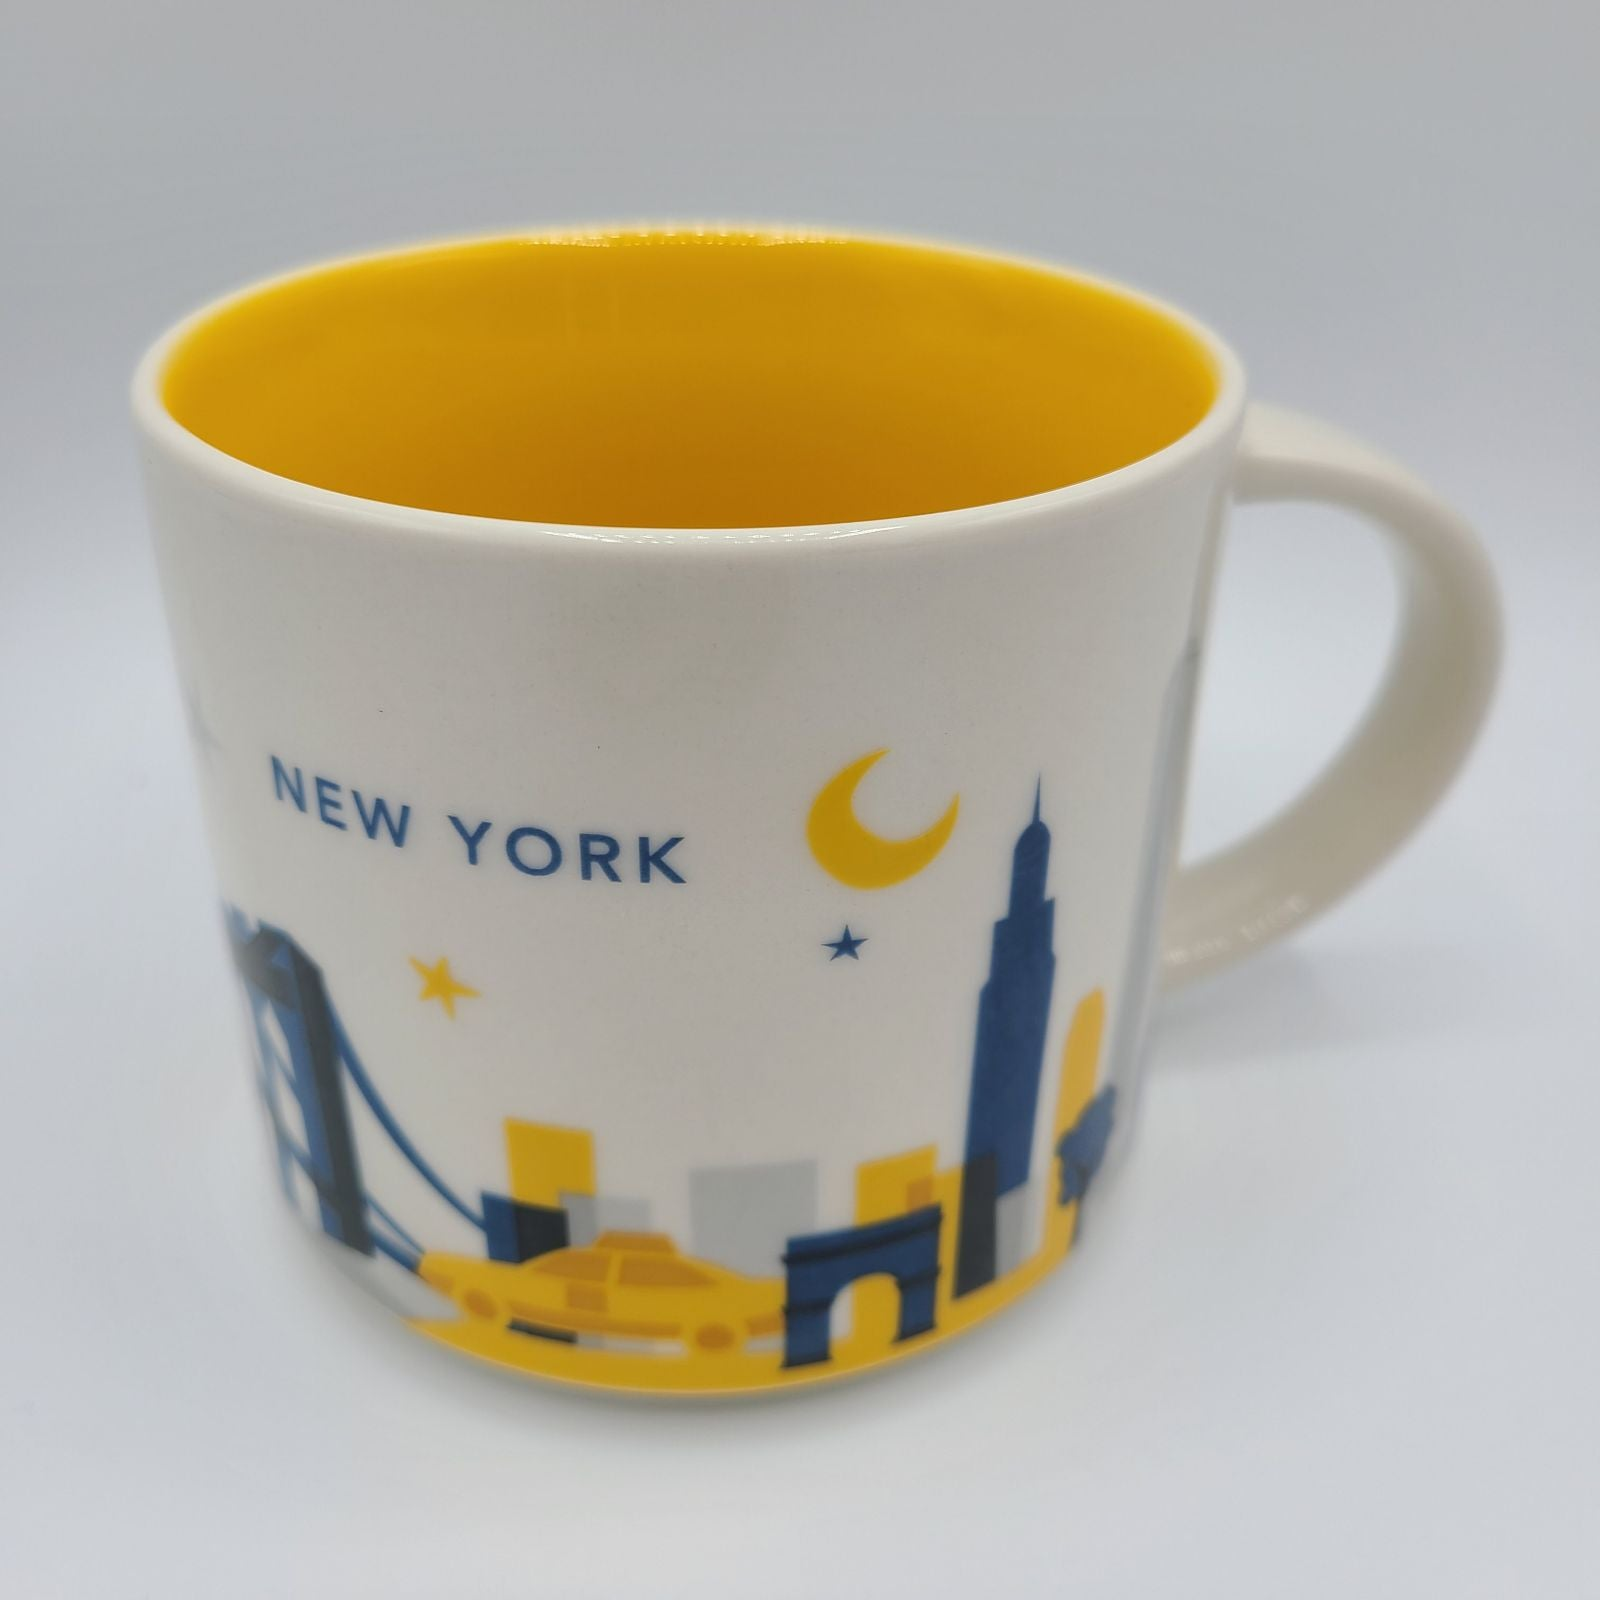 Starbucks You Are Here New York Mug